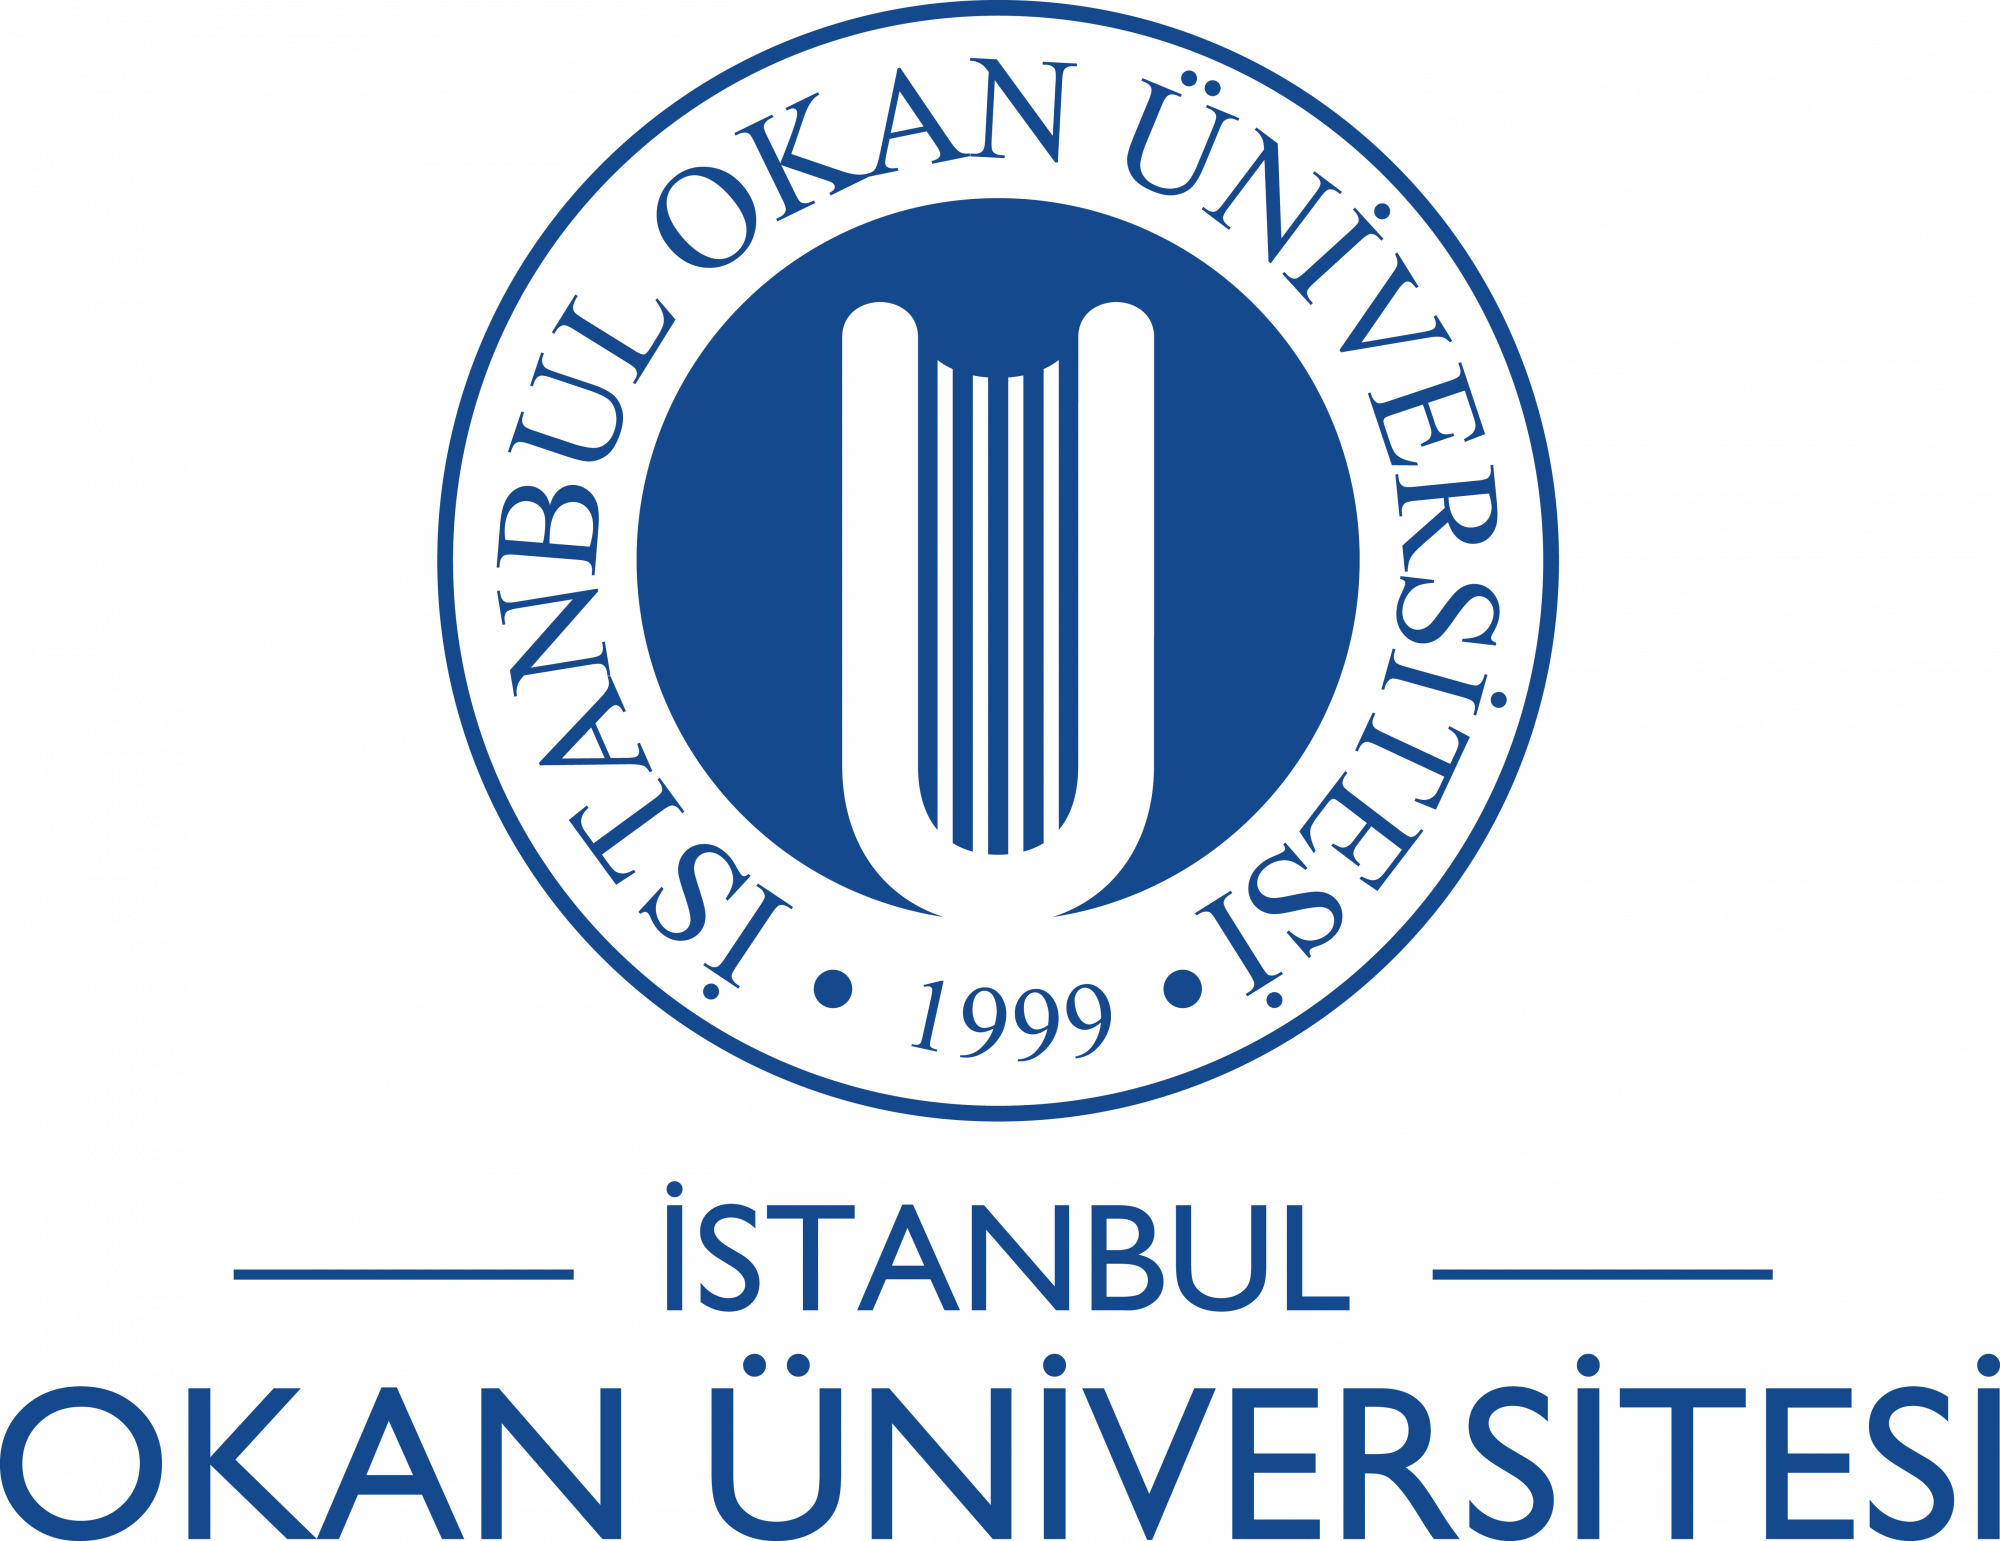 İstanbul Okan Üniversitesi tyrth